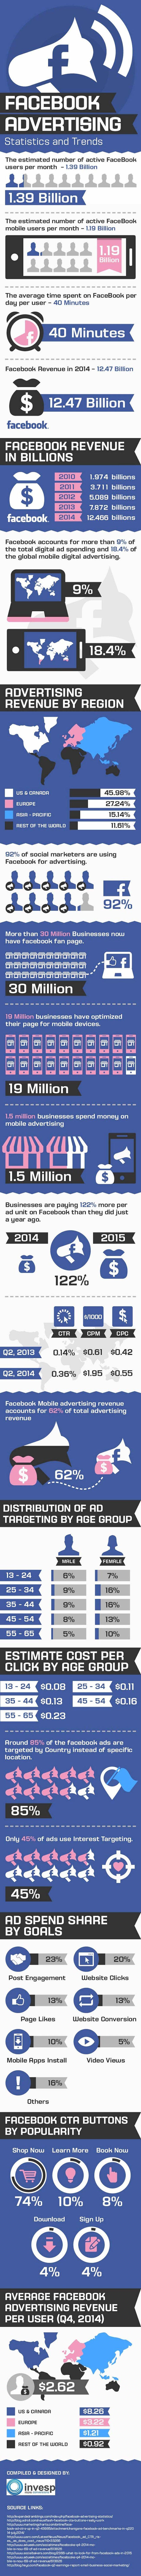 facebook-advertising-statistics